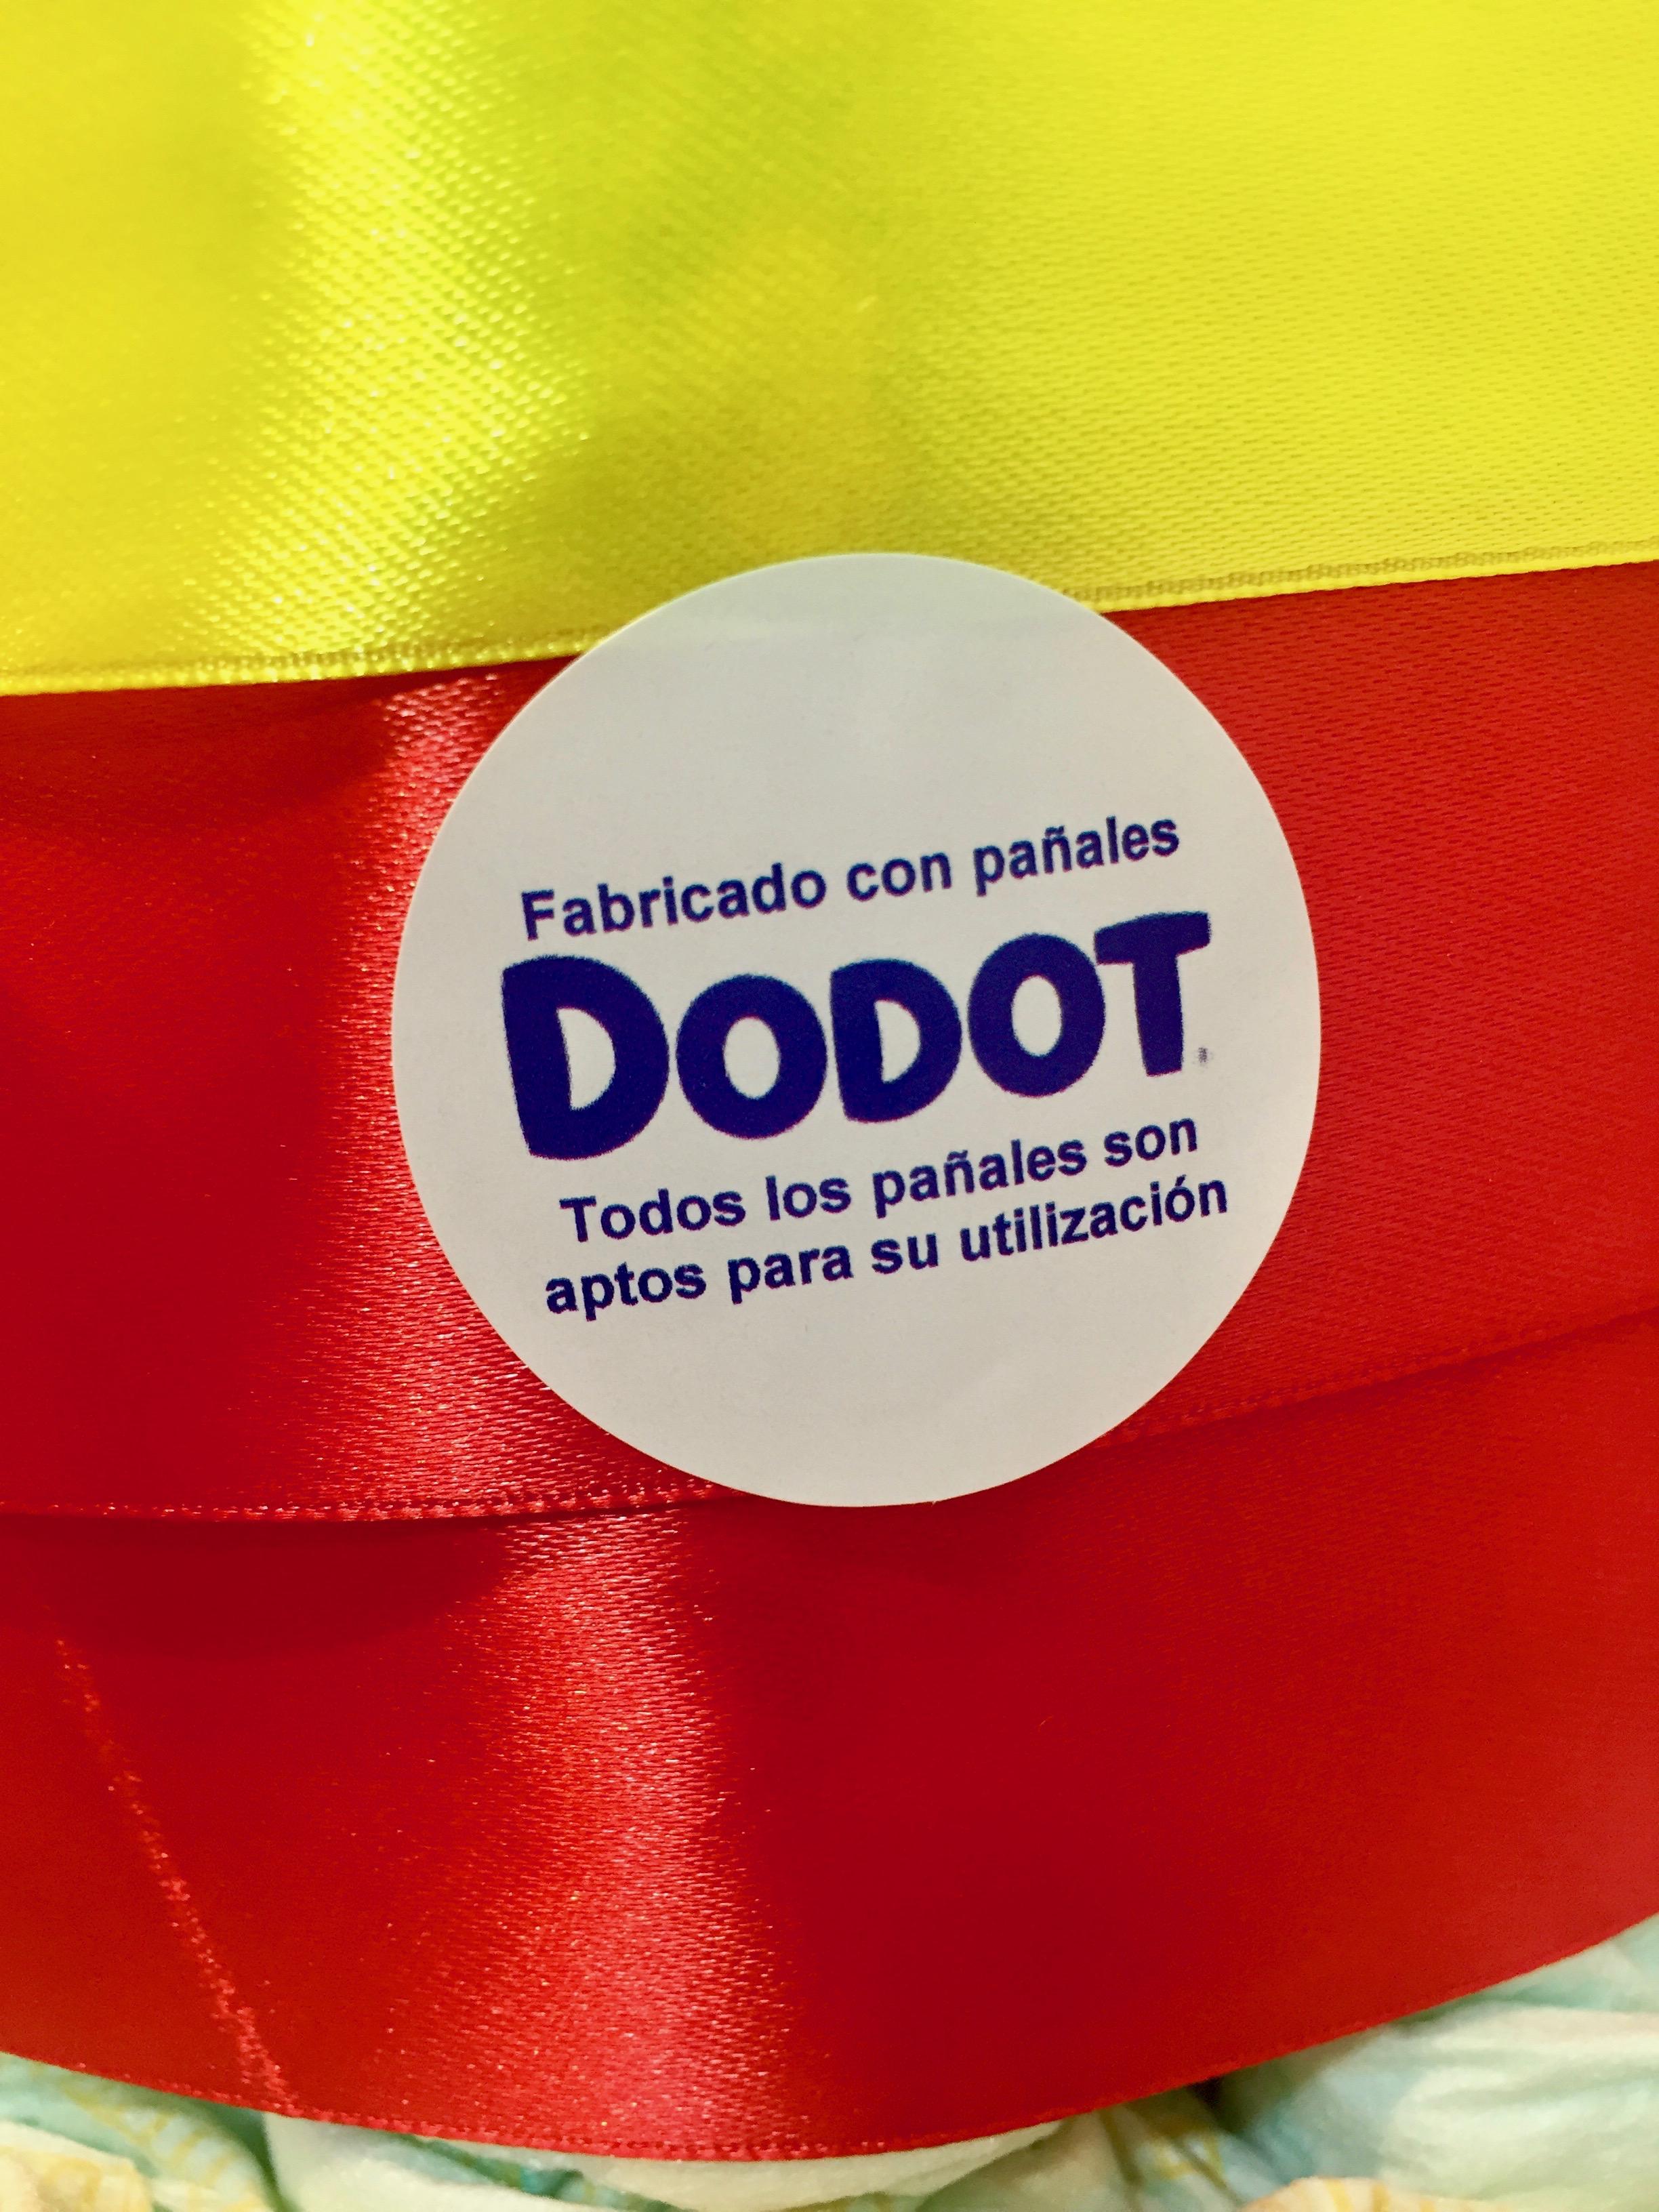 Logo-DODOT-amarillo-rojo